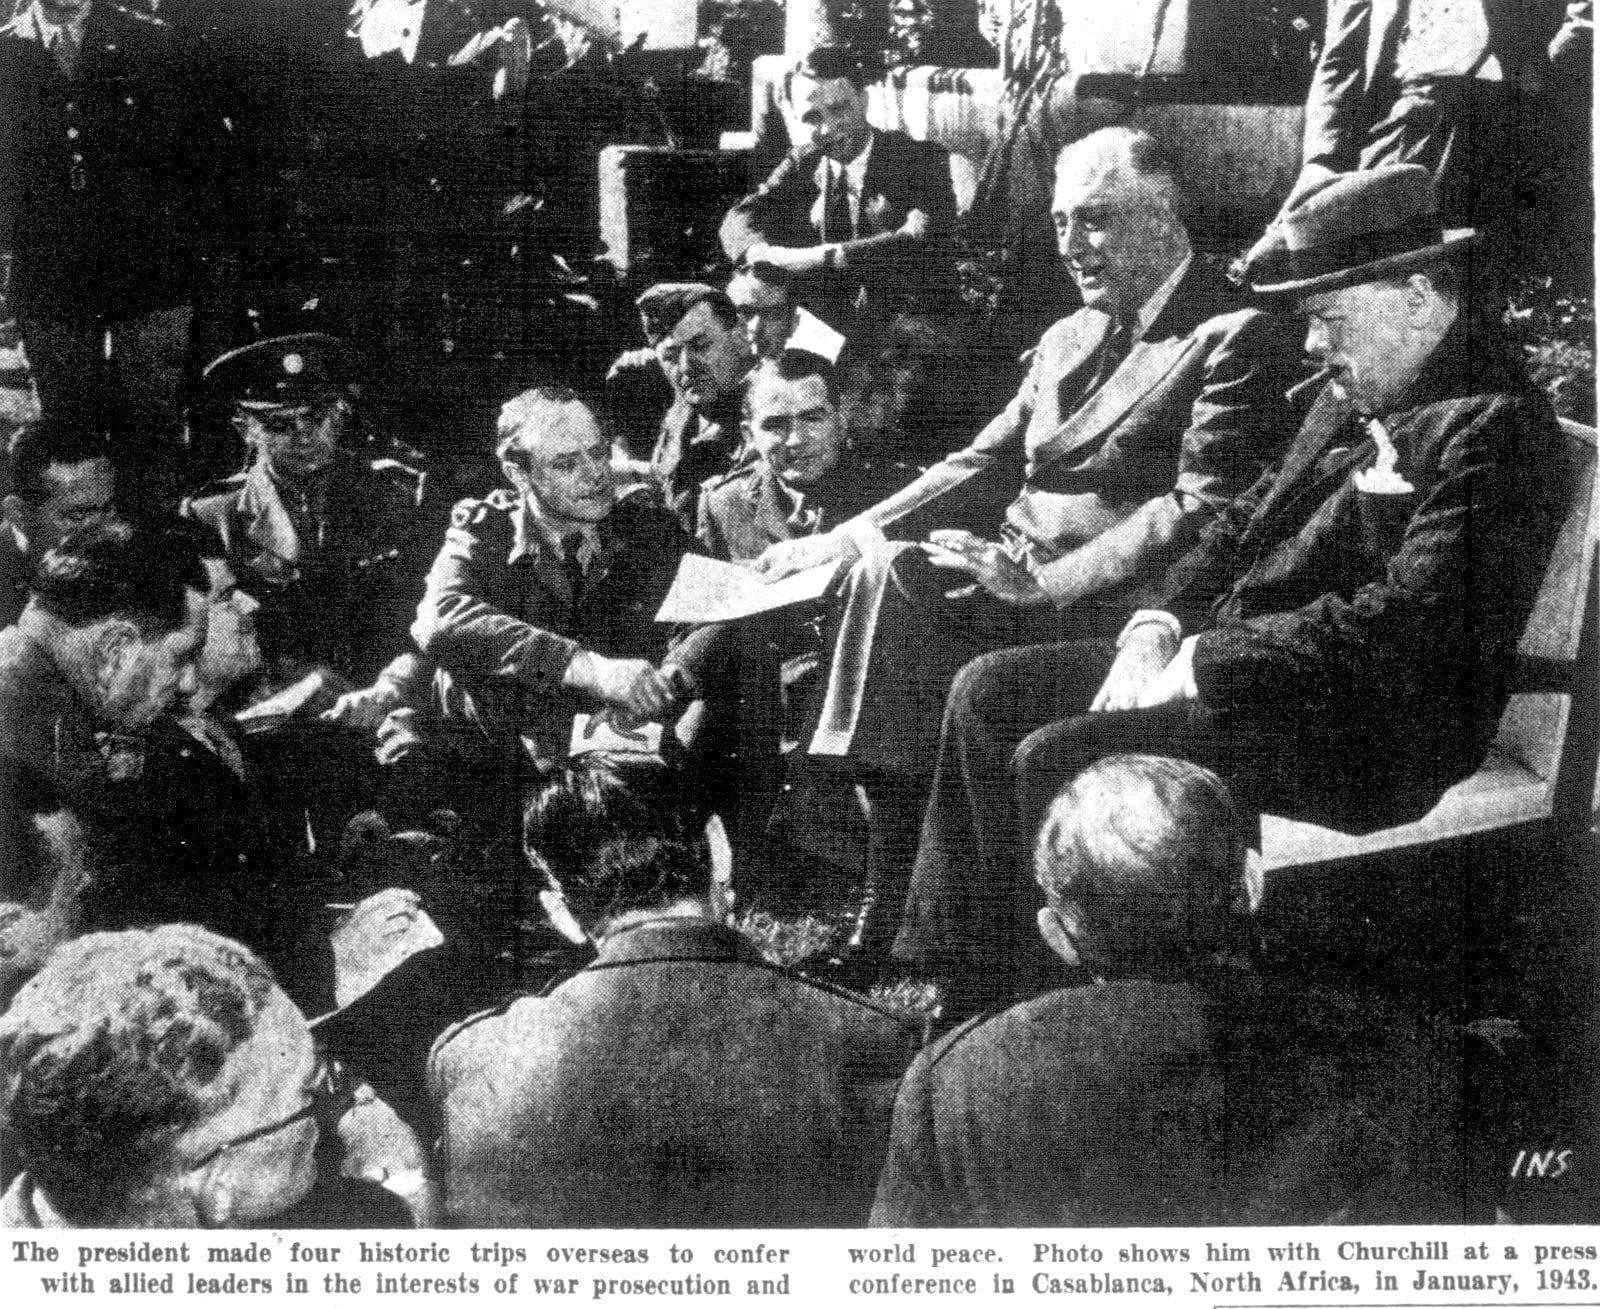 Franklin Roosevelt in Casablanca (1943)